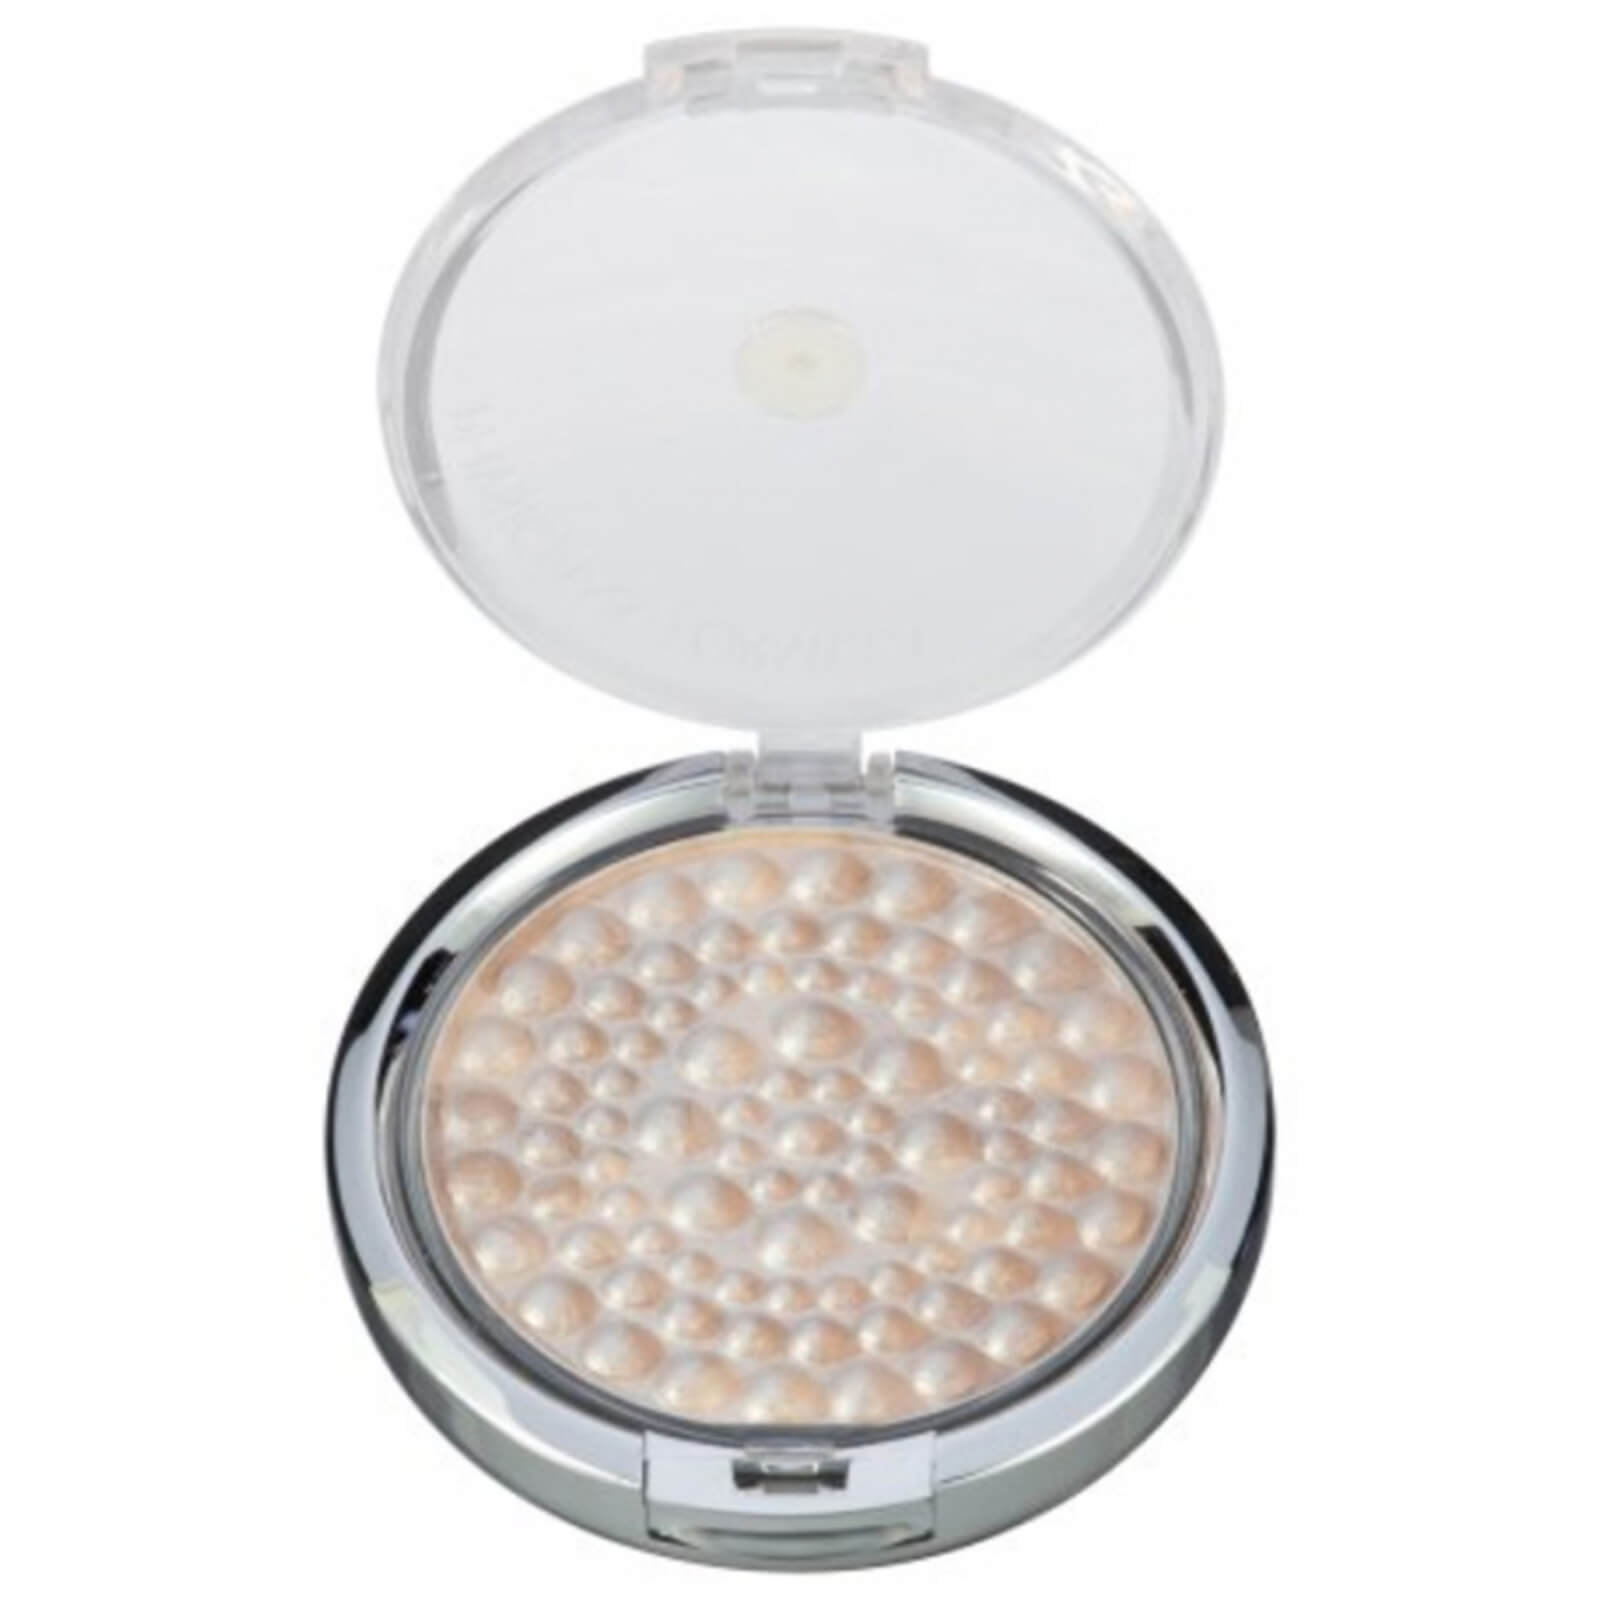 Physicians Formula Powder Palette Mineral Glow Pearls Powder Translucent